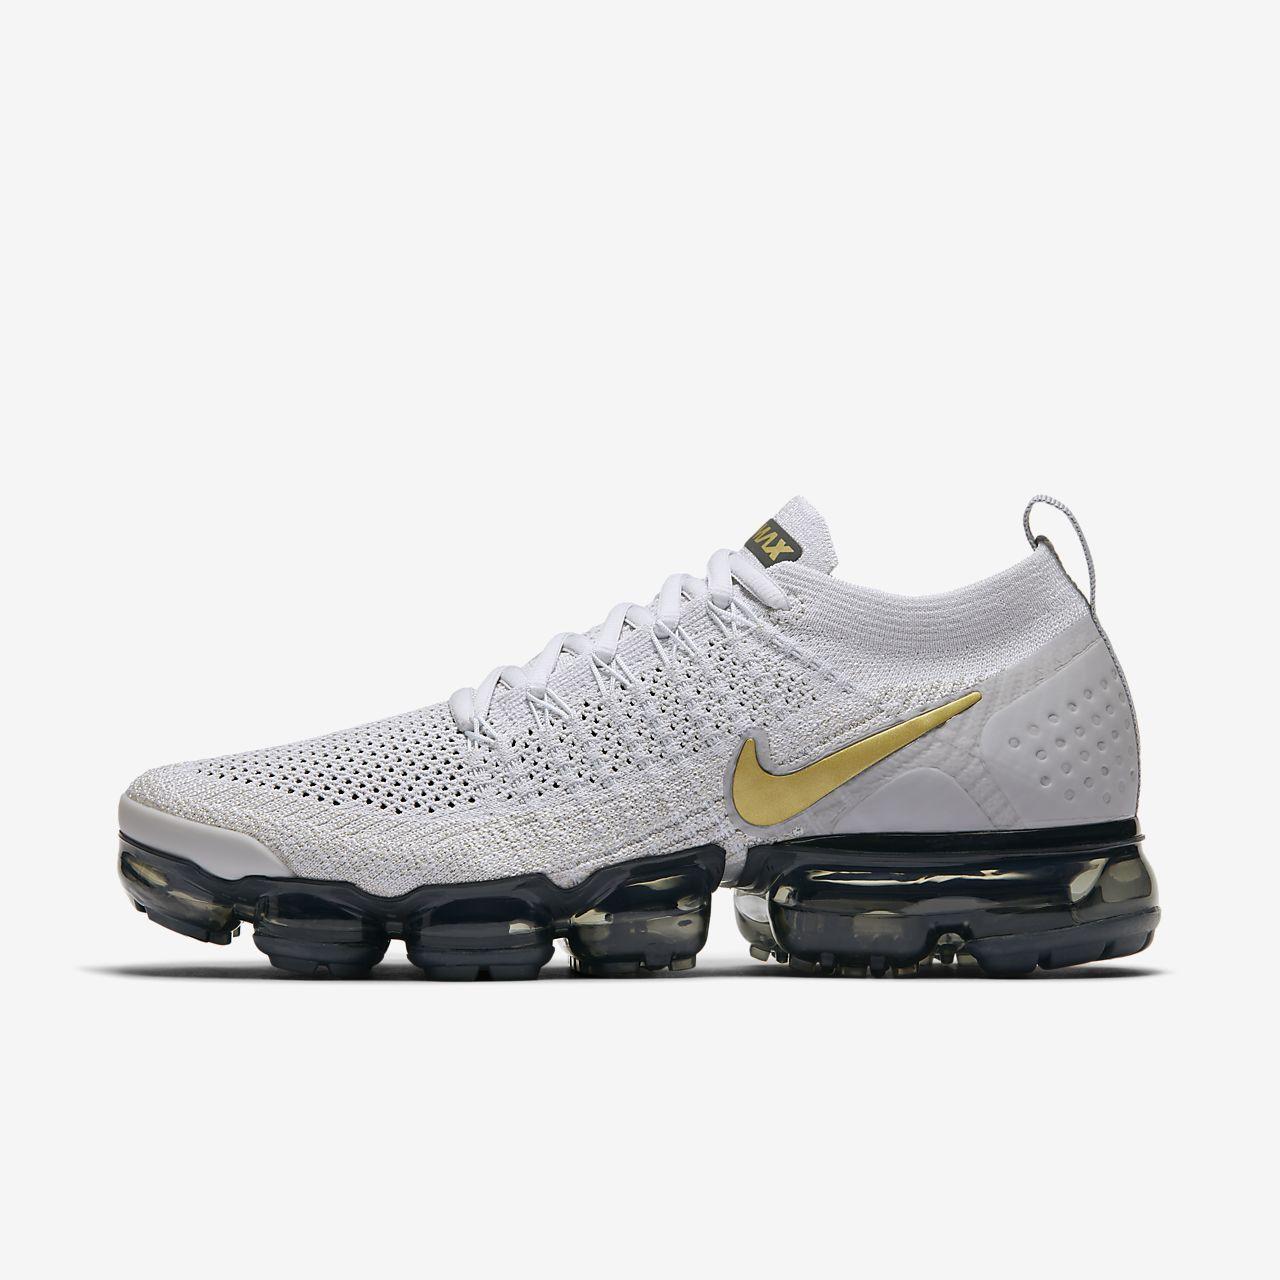 sports shoes 624ea 5f8f2 ... Nike Air VaporMax Flyknit 2 sko til dame